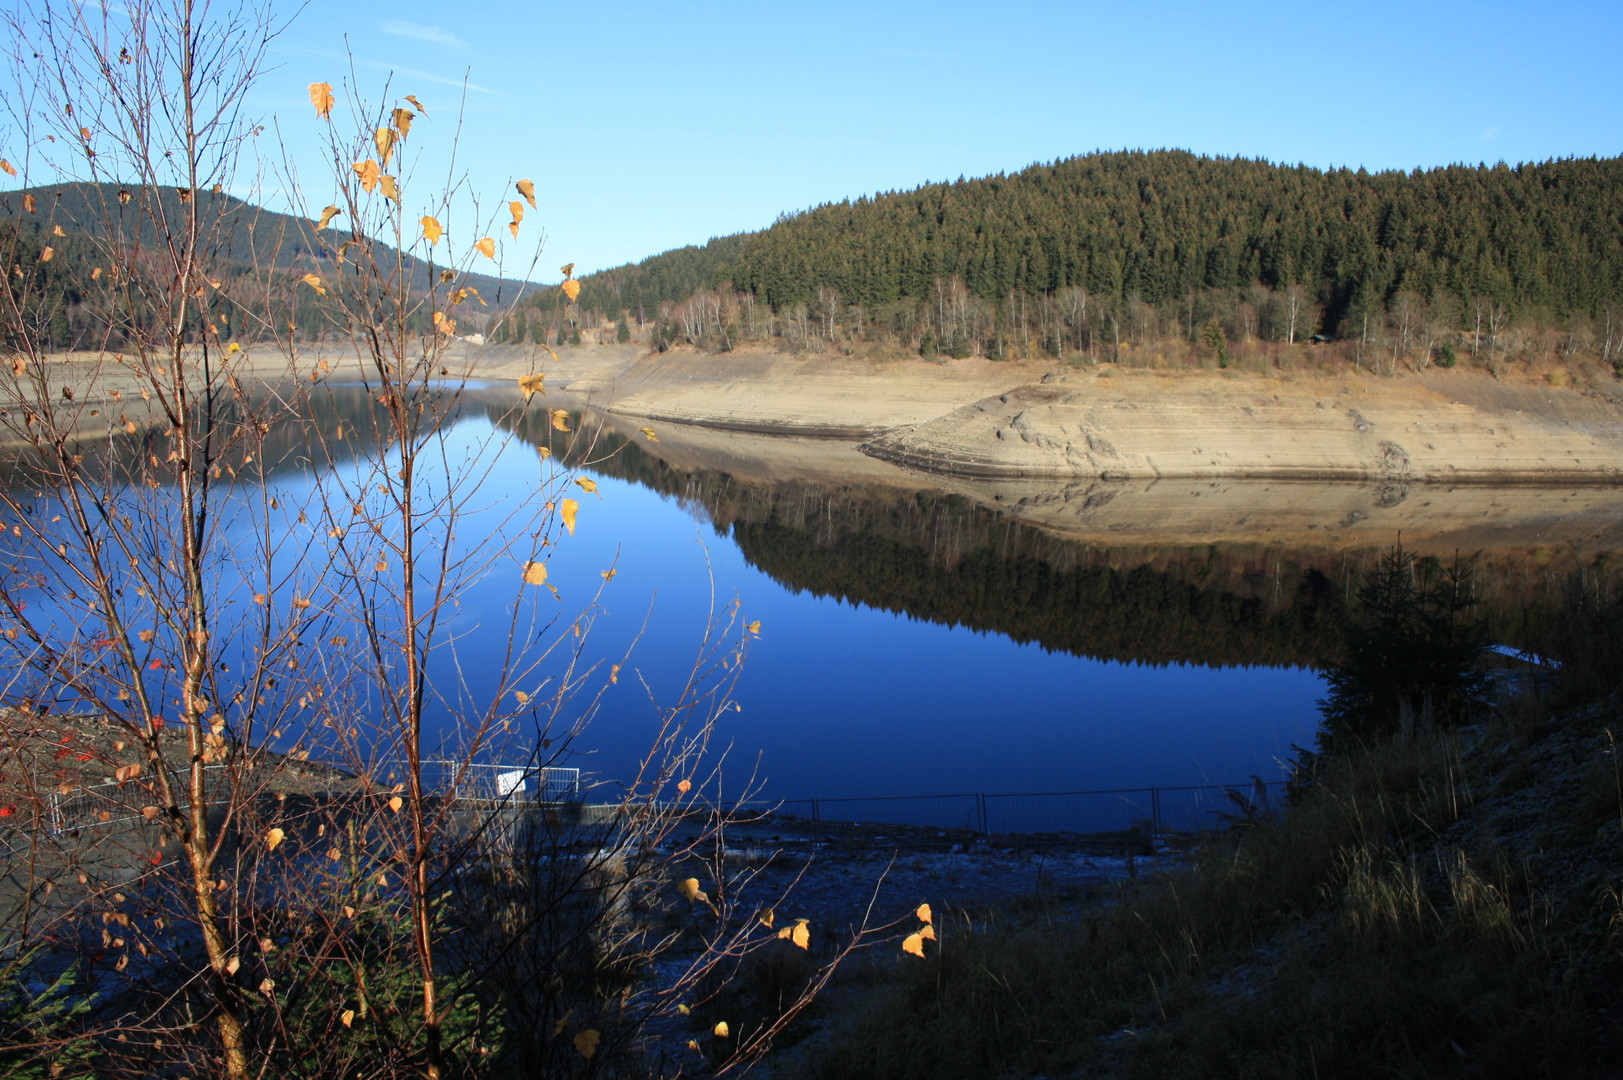 Okertalsperre Altenau im Harz